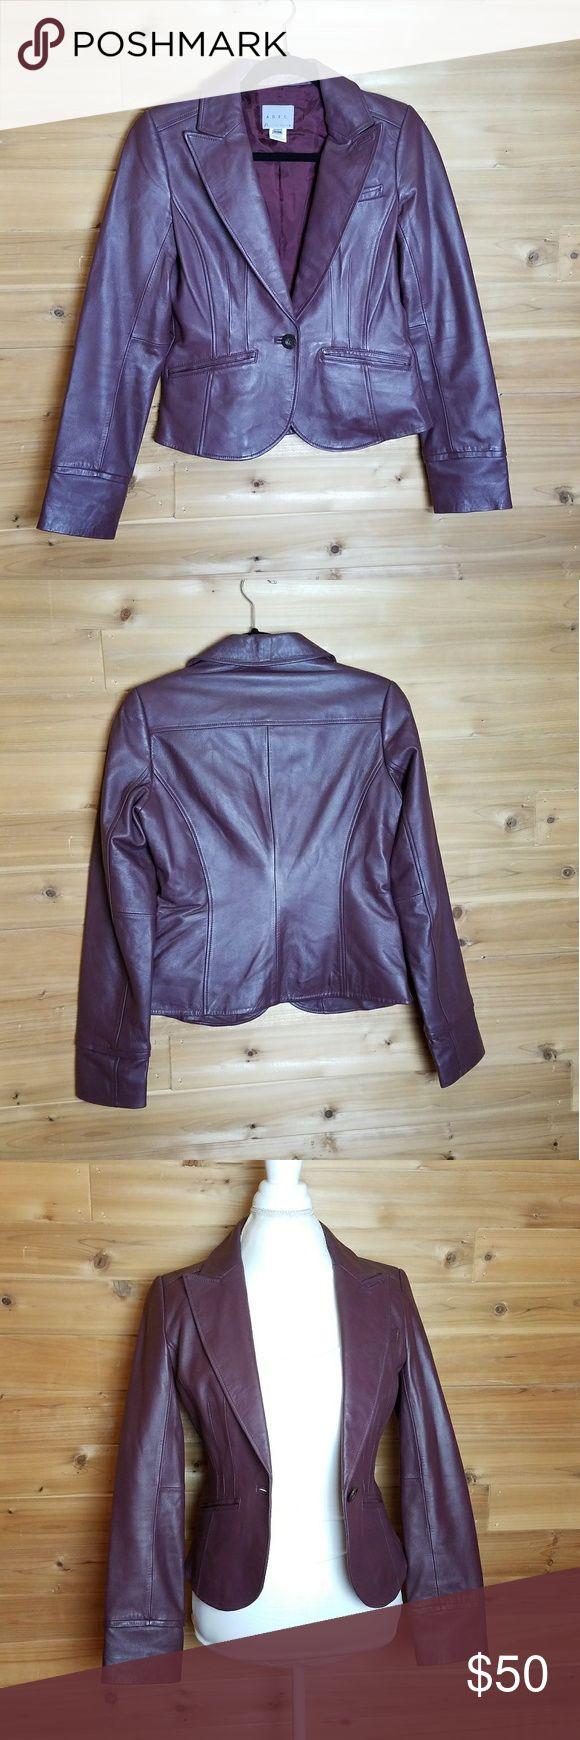 "Philipe Adec ADEC2 Purple Leather Jacket, size 2 - Armpit to Armpit: 17"" - Armpit to Hem: 12""  - Shoulder to Hem: 19.5"" - Neck to Hem: 21""  - 100% leather Philipe Adec ADEC2 Jackets & Coats"